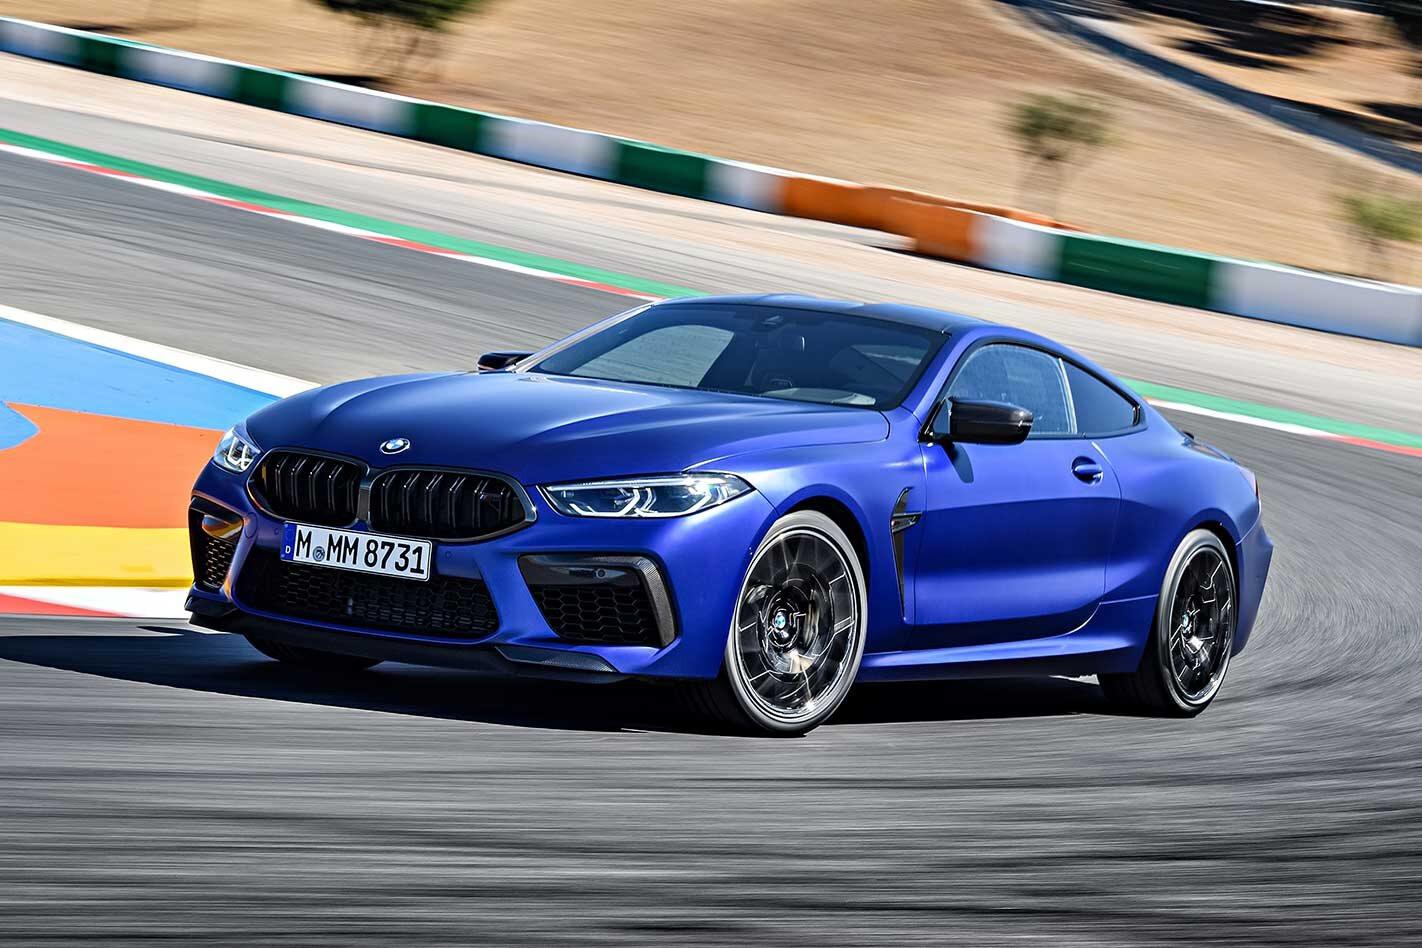 BMW M8 Competition Australia pricing